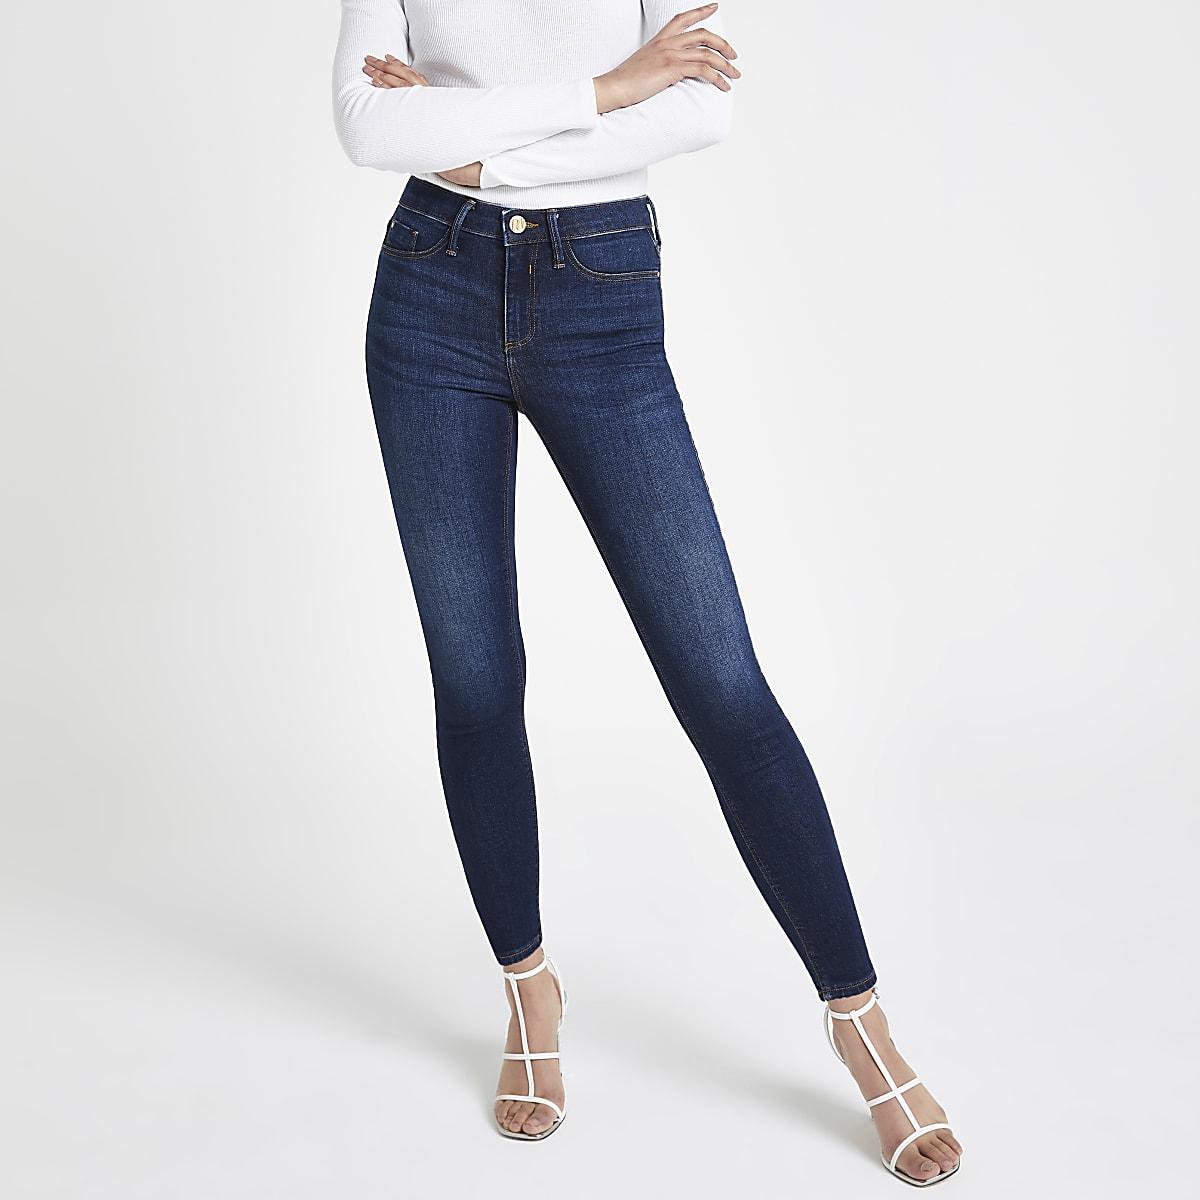 c14a5c03c8fdb Dark denim Molly mid rise jeggings - Jeggings - Jeans - women